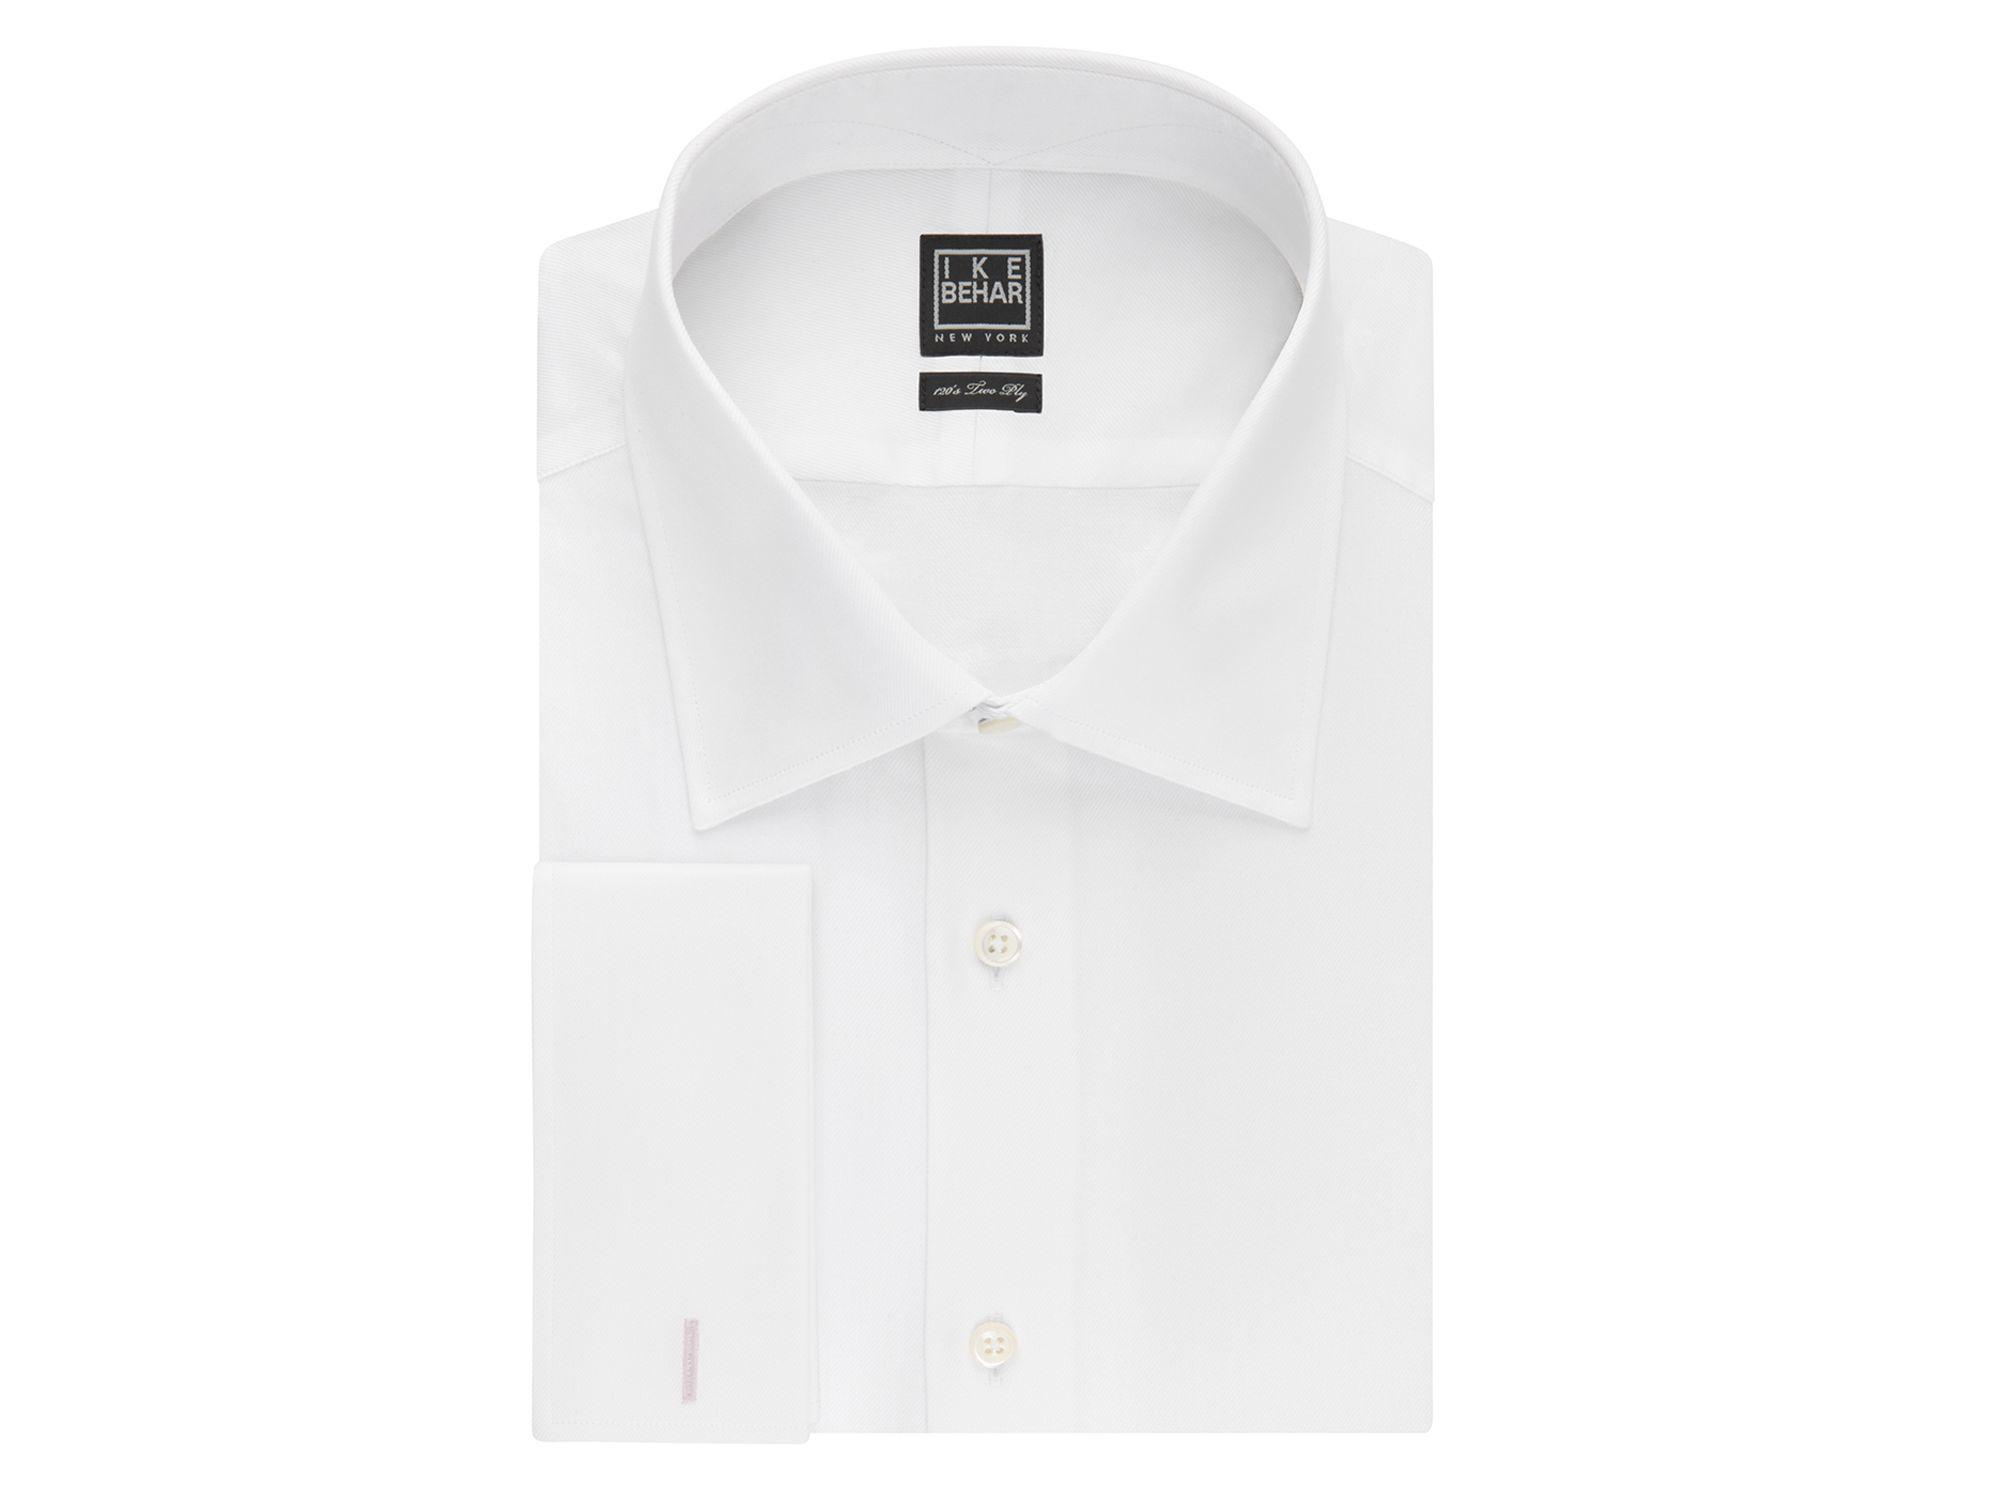 Lyst Ike Behar Solid French Cuff Classic Fit Dress Shirt